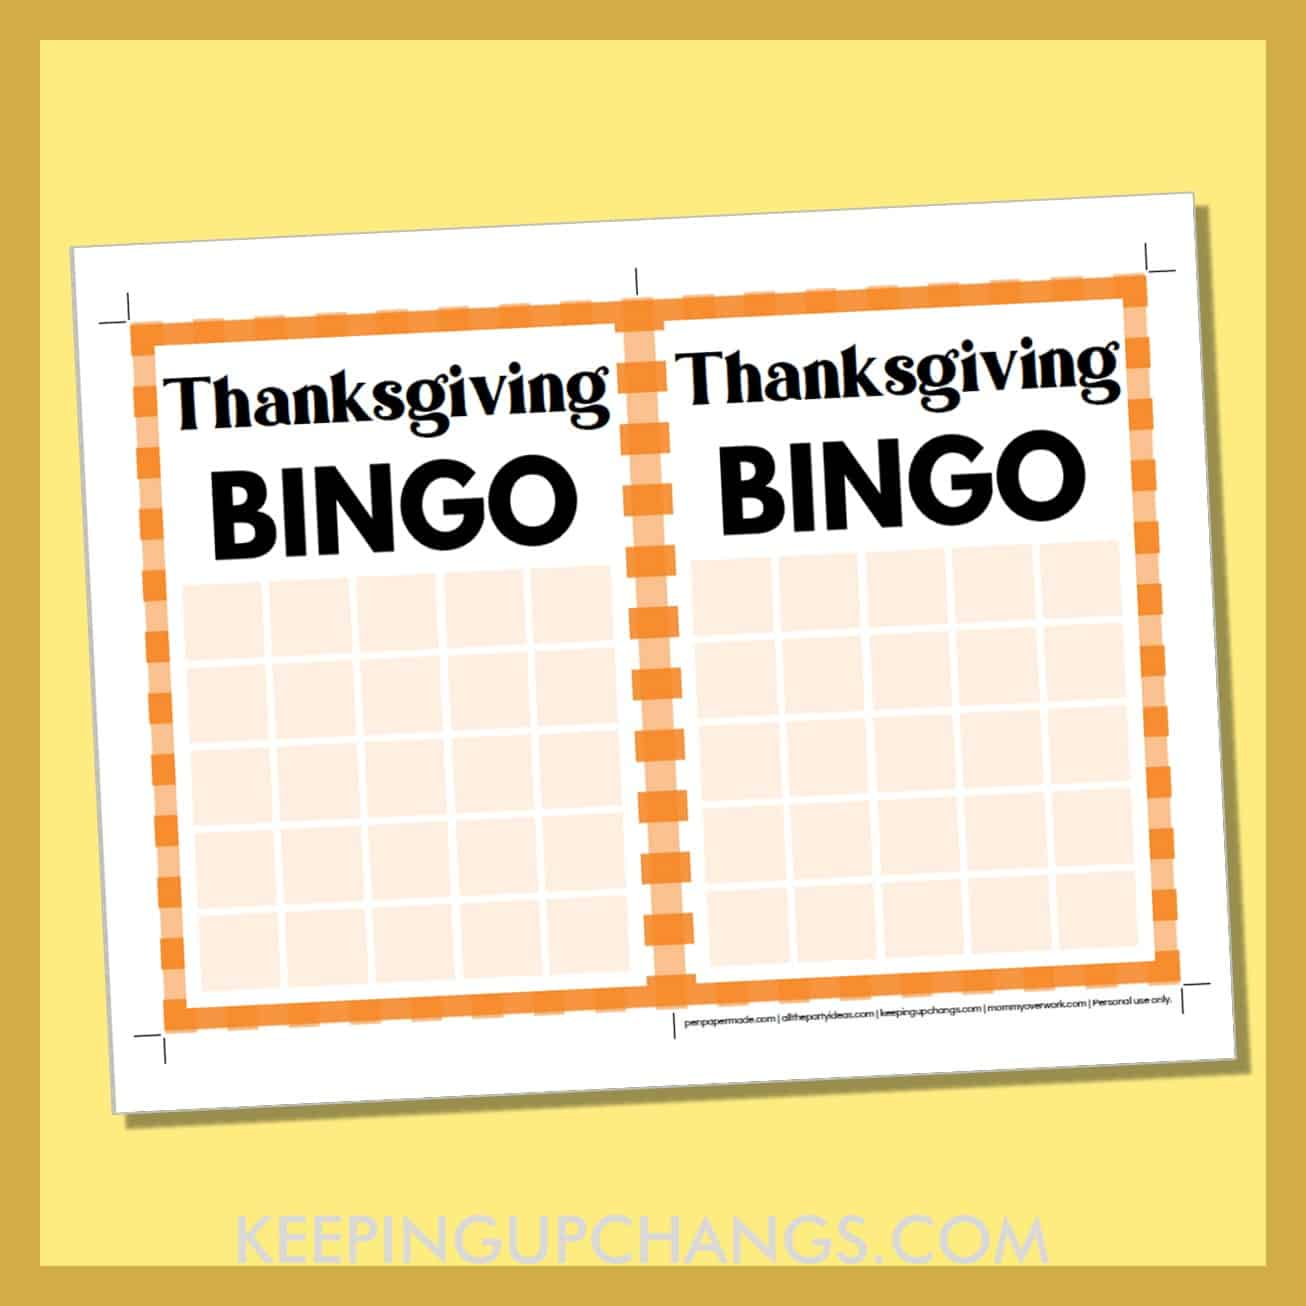 free thanksgiving bingo 5x5 grid game board blank template.